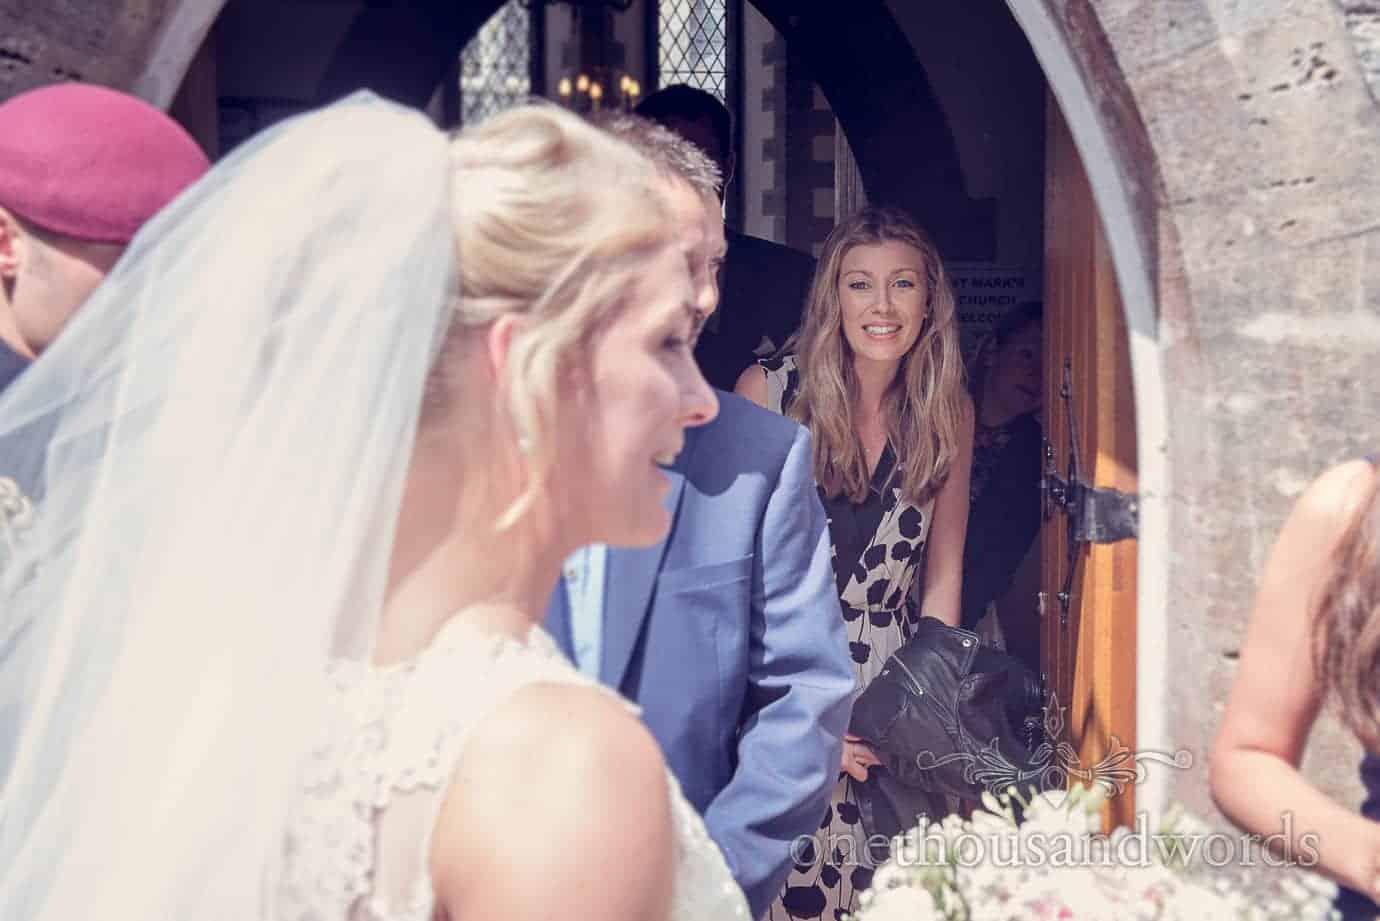 Wedding guest looks through church stone doorway at bride